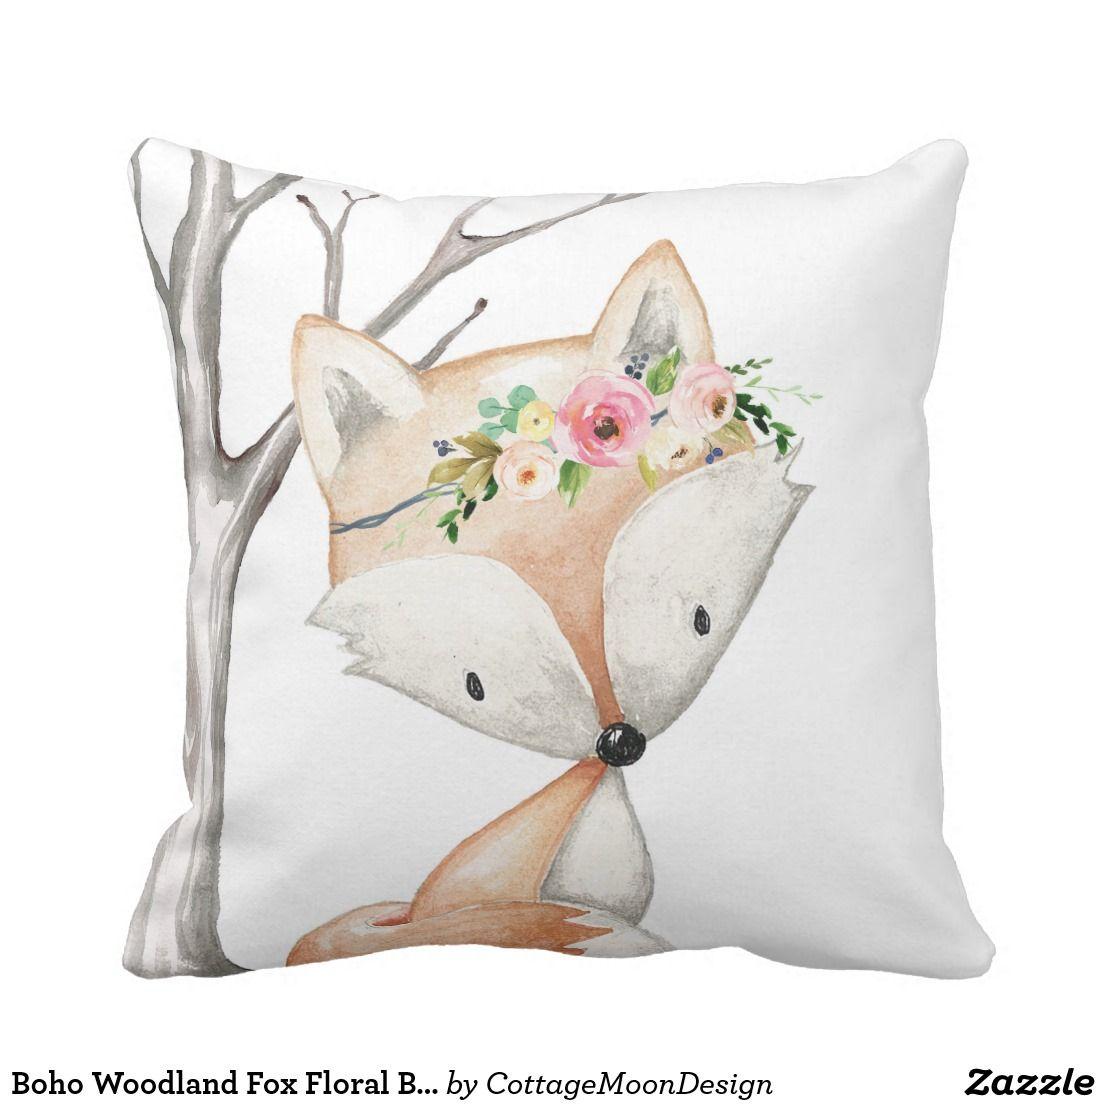 Boho Woodland Fox Floral Birl Nursery Throw Pillow Zazzle Com Nursery Throw Pillows Tribal Baby Nursery Throw Pillows